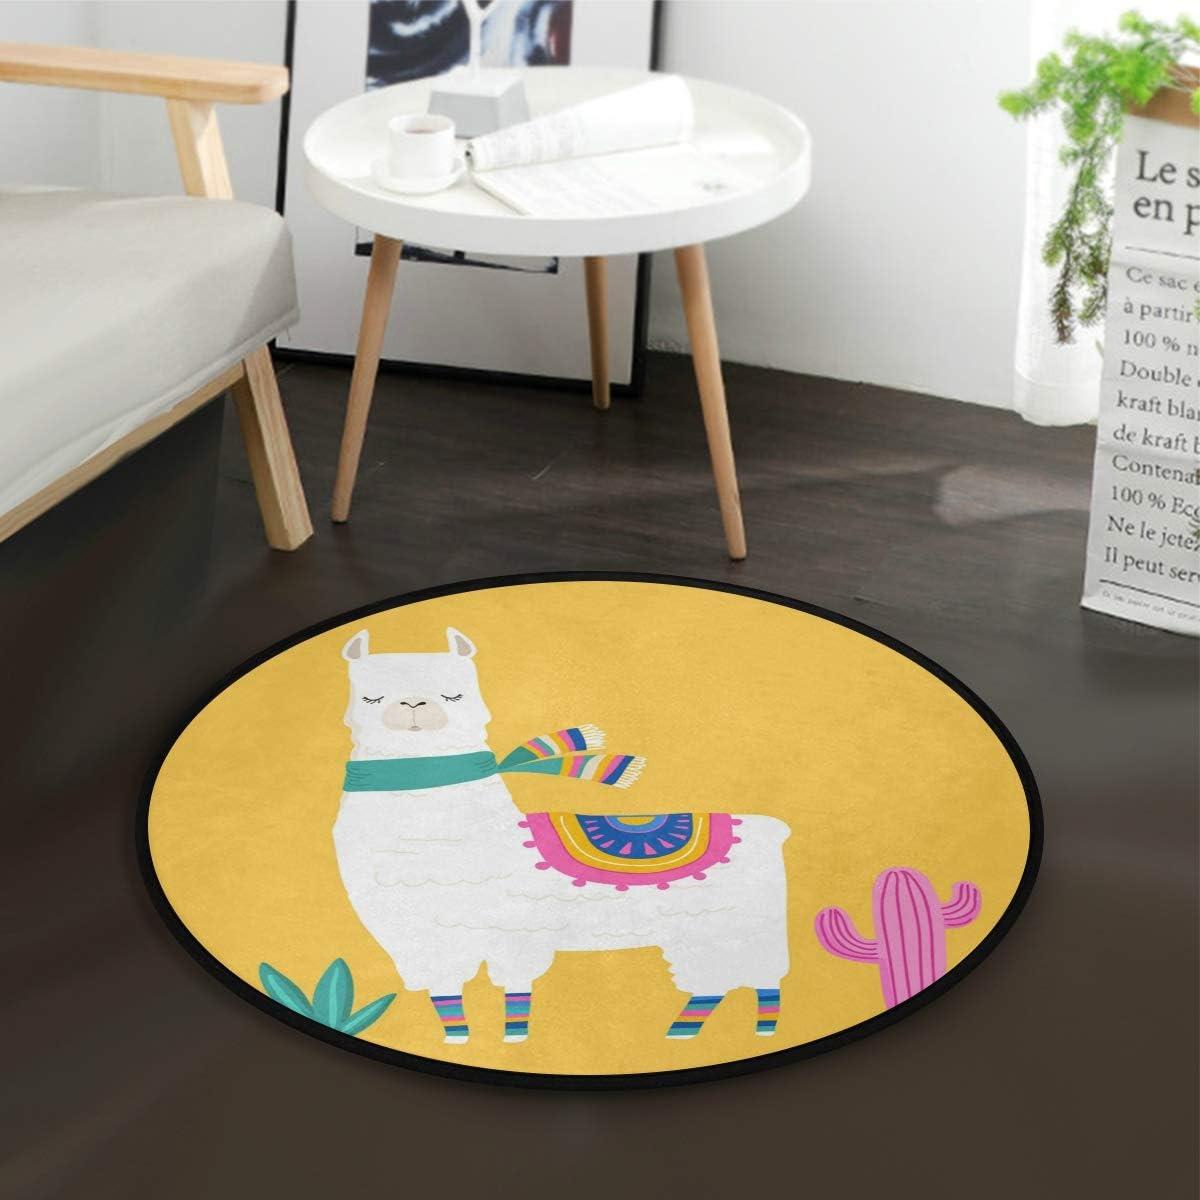 Amazon Com Round Area Rugs Llama Yellow Non Slip Soft Carpet Living Room Bedroom Doormats Kitchen Floor Mat Bath Rug For Home Decor 3 Ft Diameter Kitchen Dining